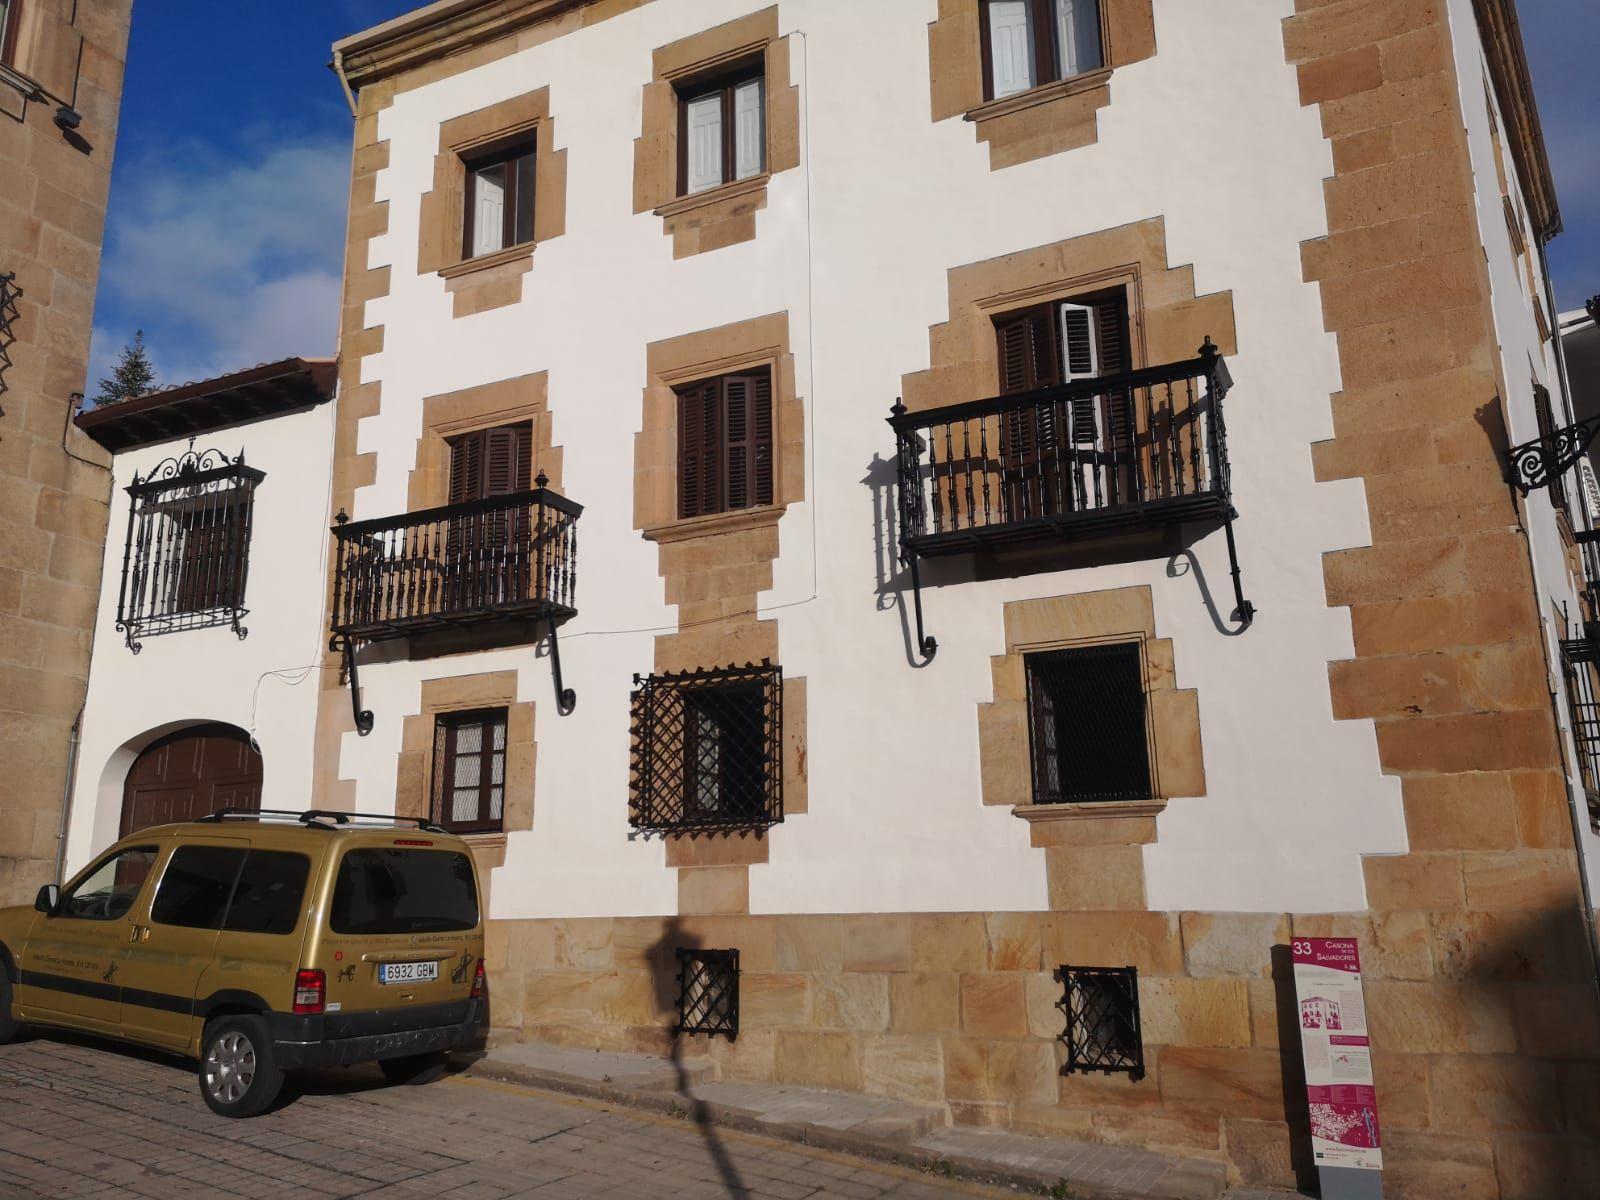 Pintura de fachadas Soria Pinturas Adolfo Corral La Huerta